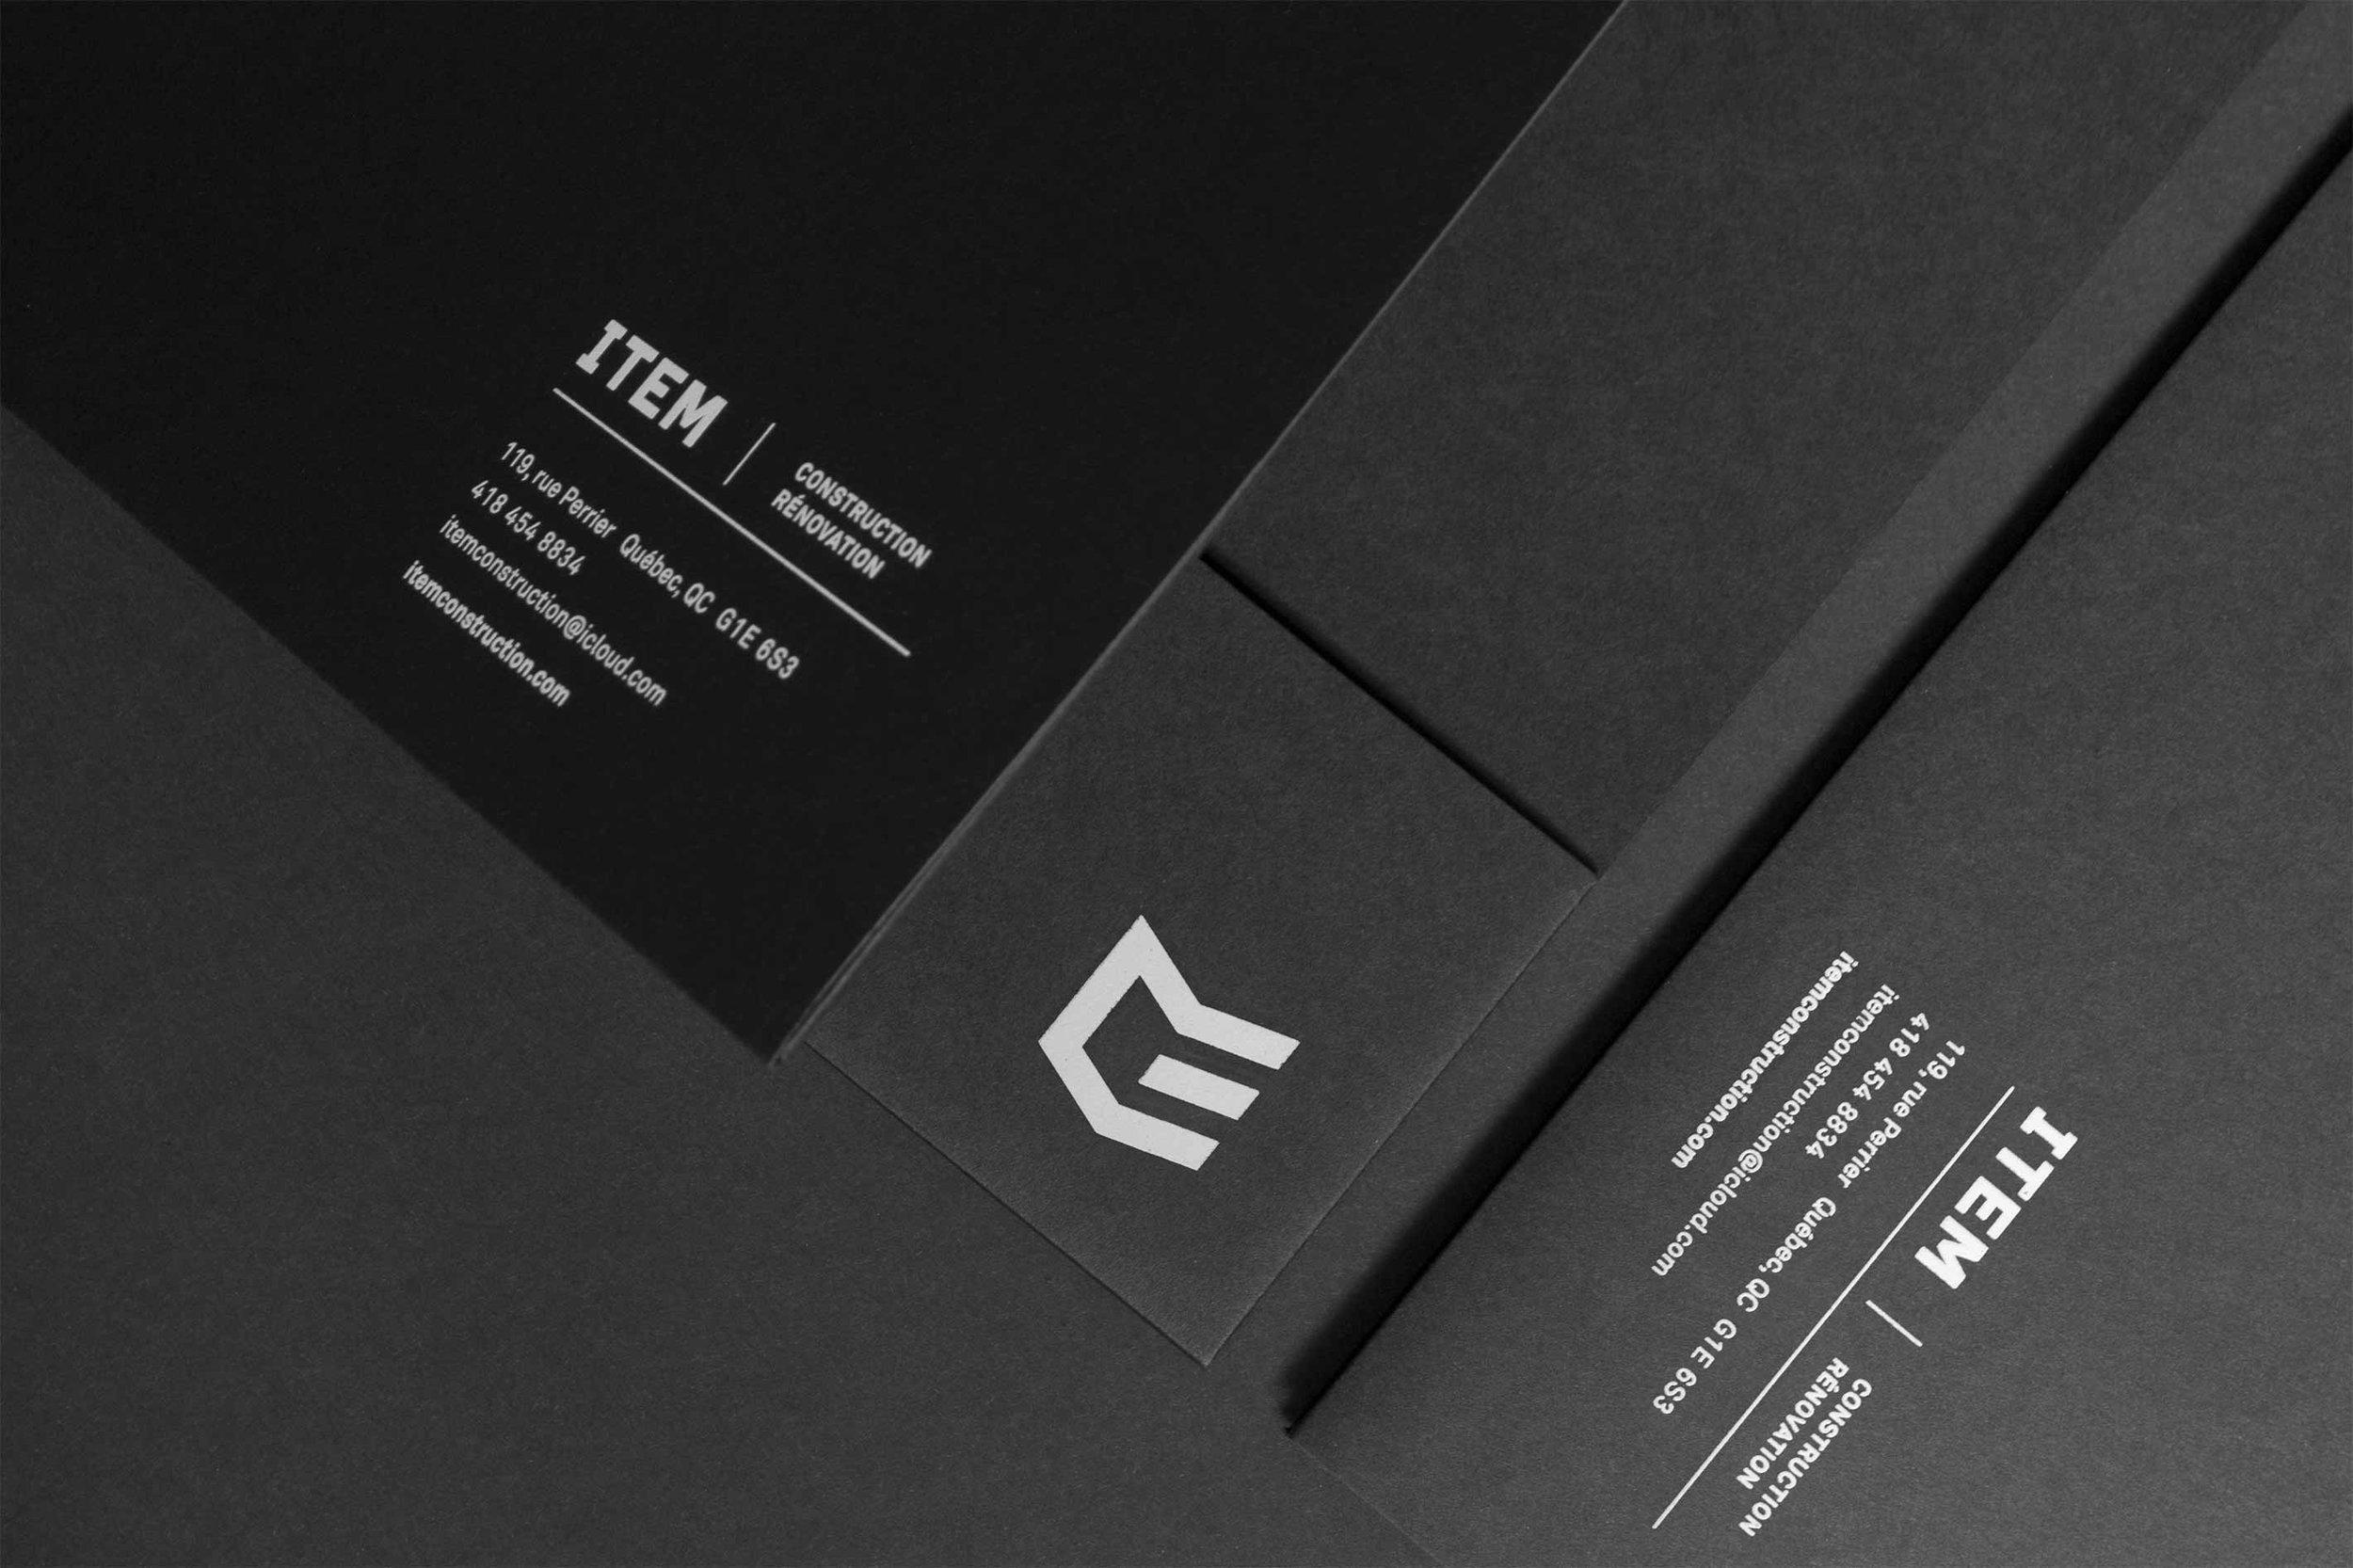 Figure-Jeremy-Hall-Design-Graphique-Quebec-Logo-Branding-Image-De-Marque-Item-Construction-16.jpg